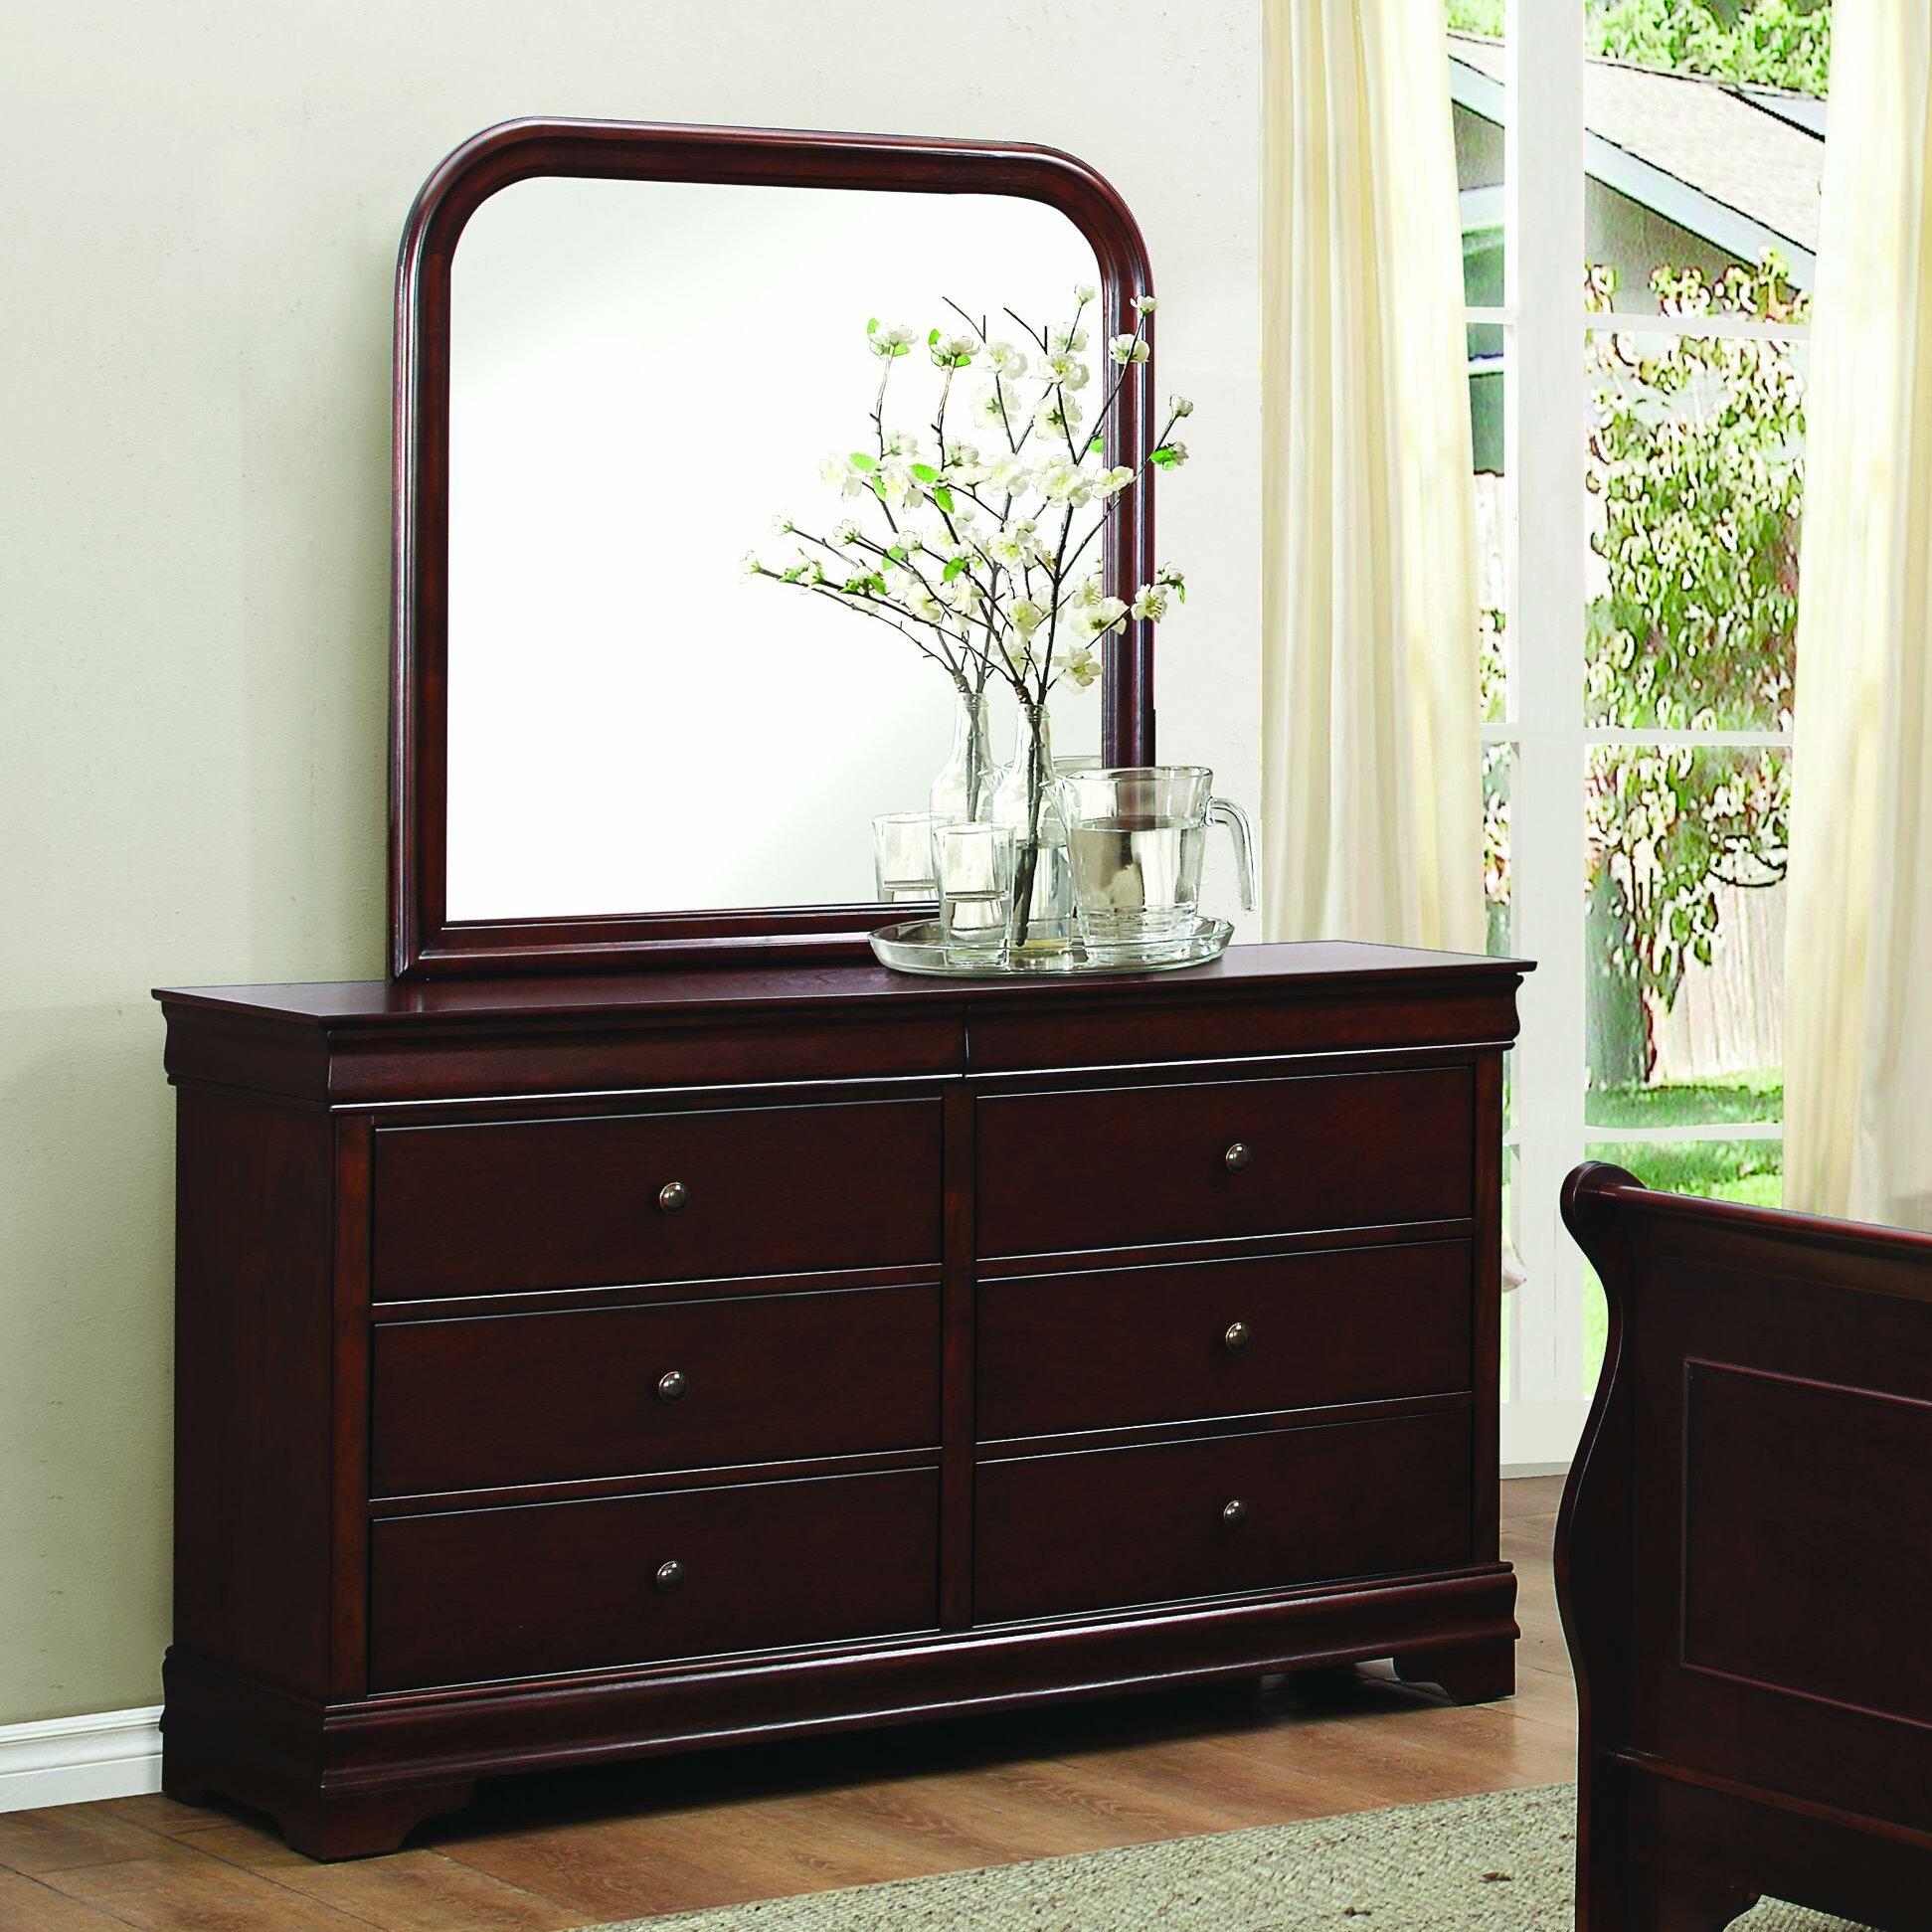 Homelegance Abbeville 6 Drawer Dresser With Mirror U0026 Reviews | Wayfair